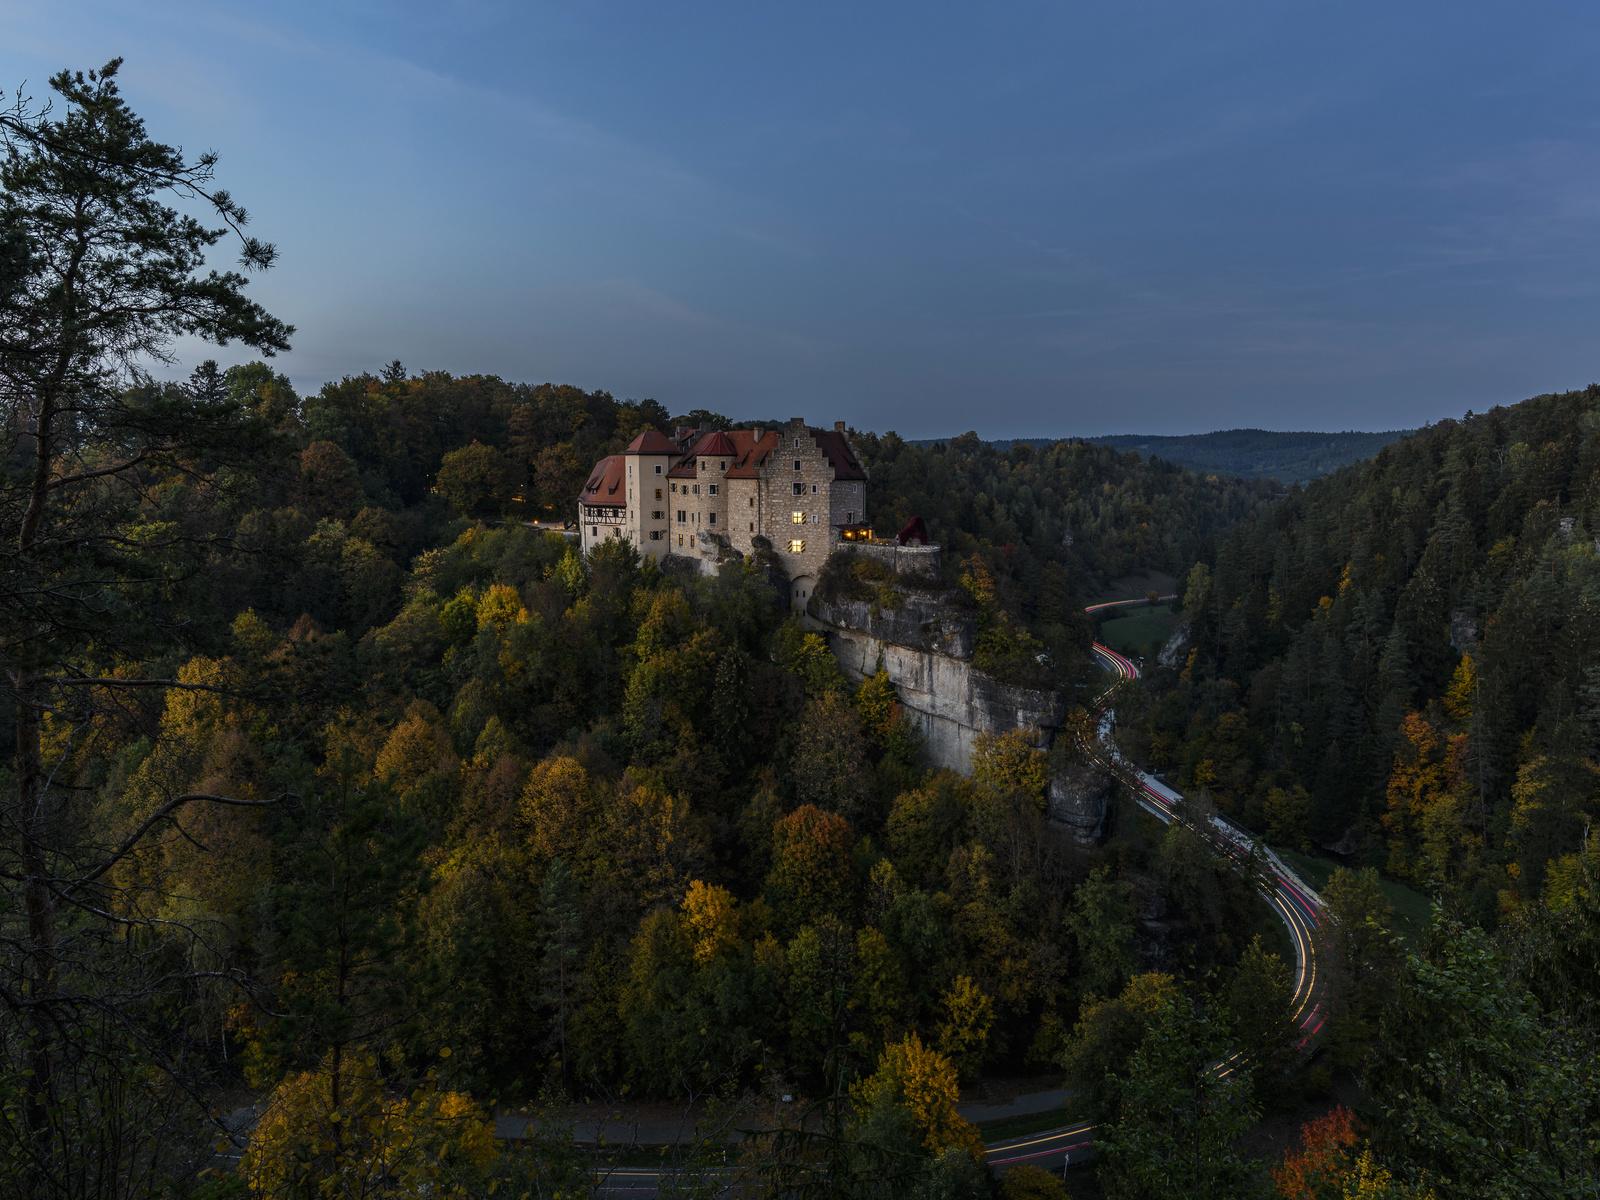 германия, замок, лес, дорога, вечер